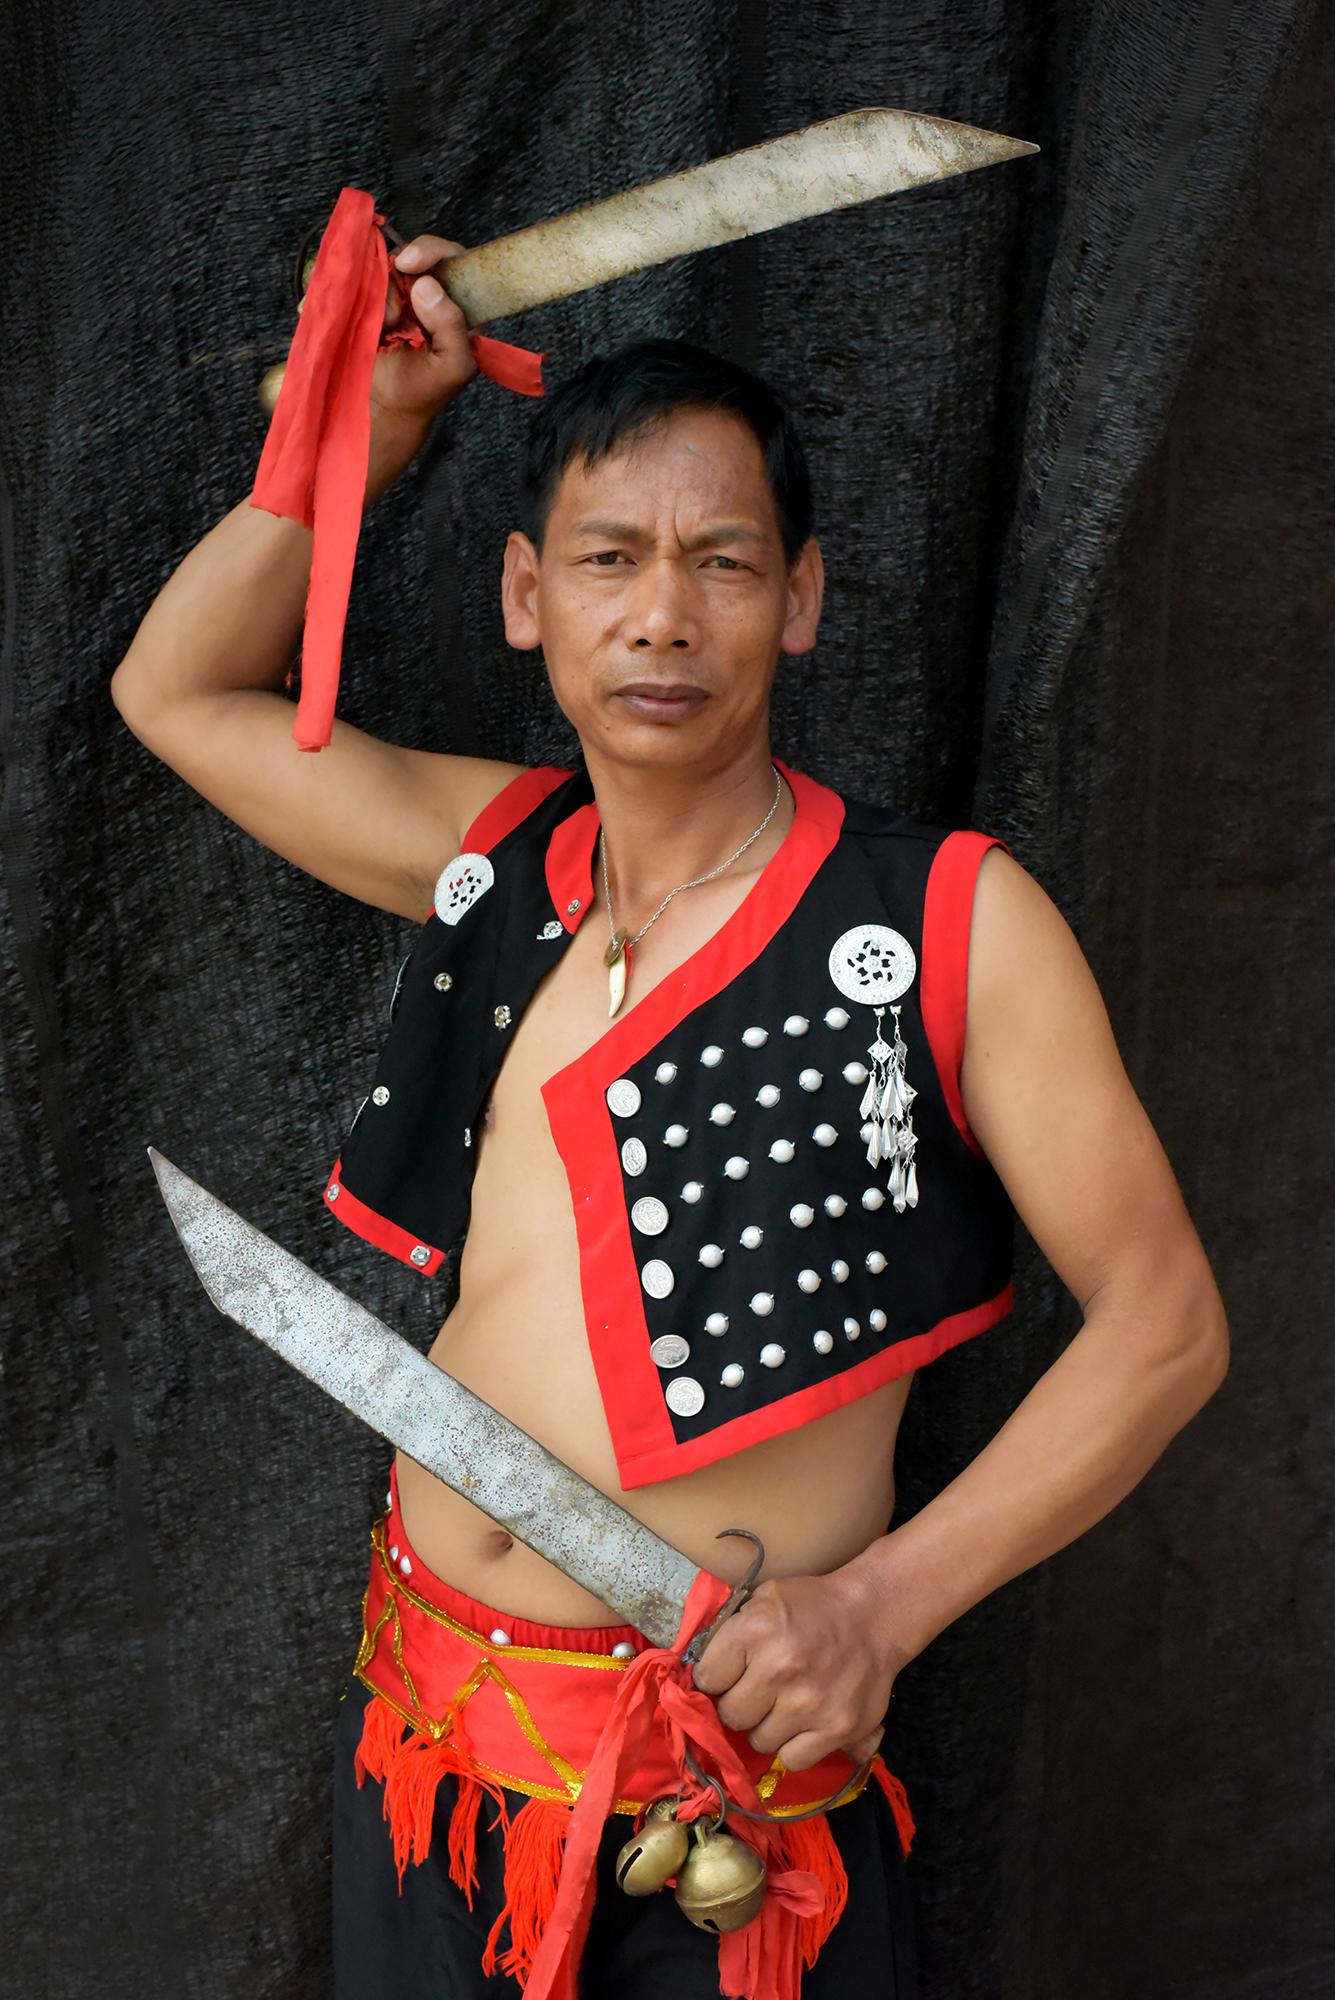 Yang Xue Lin